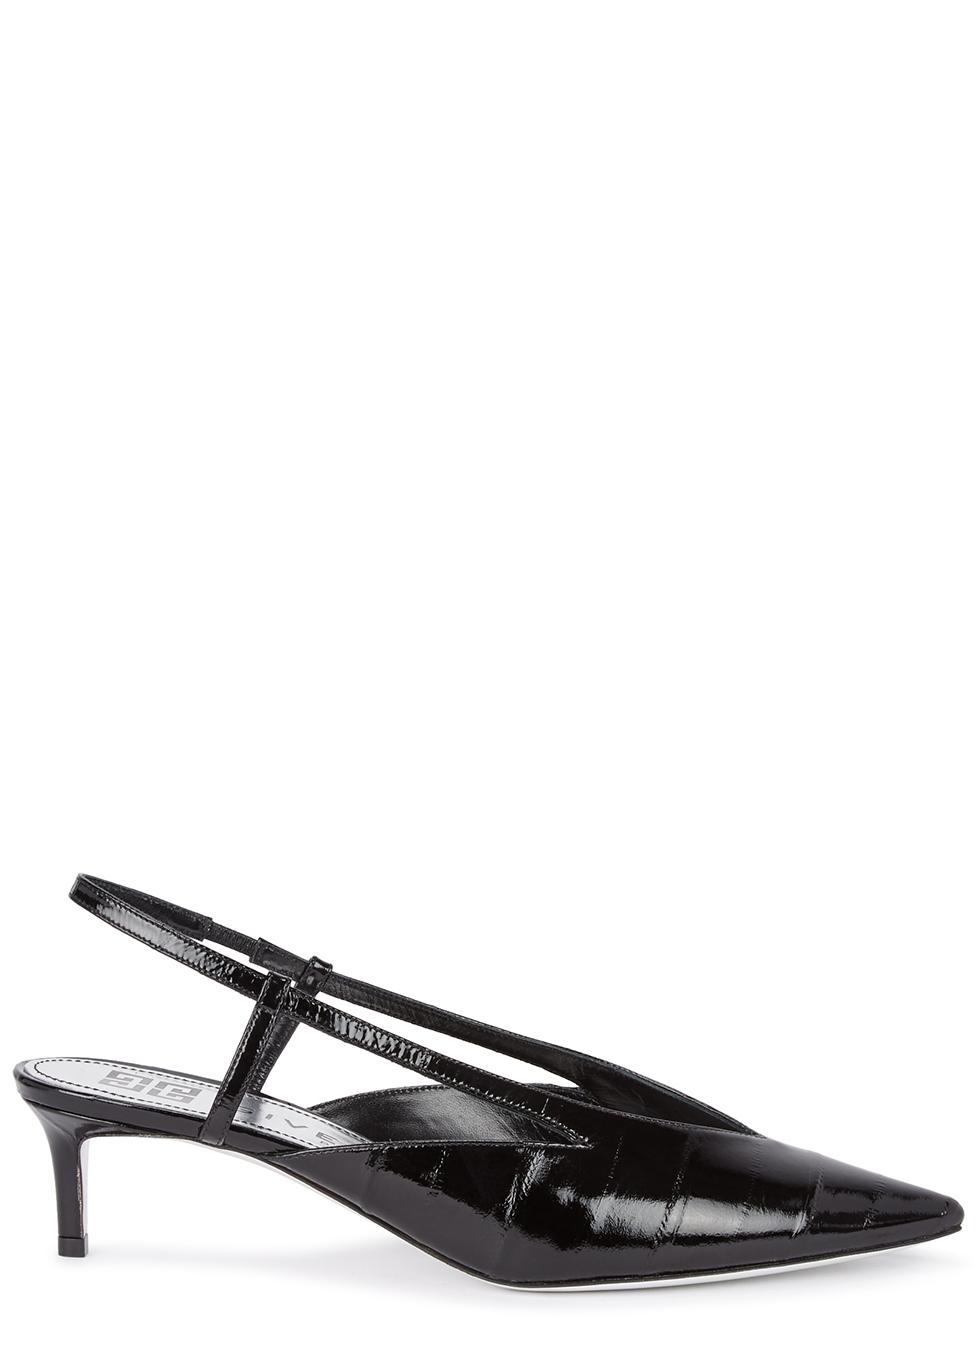 f87888cdadc Women s Designer Shoes - Ladies Shoes - Harvey Nichols